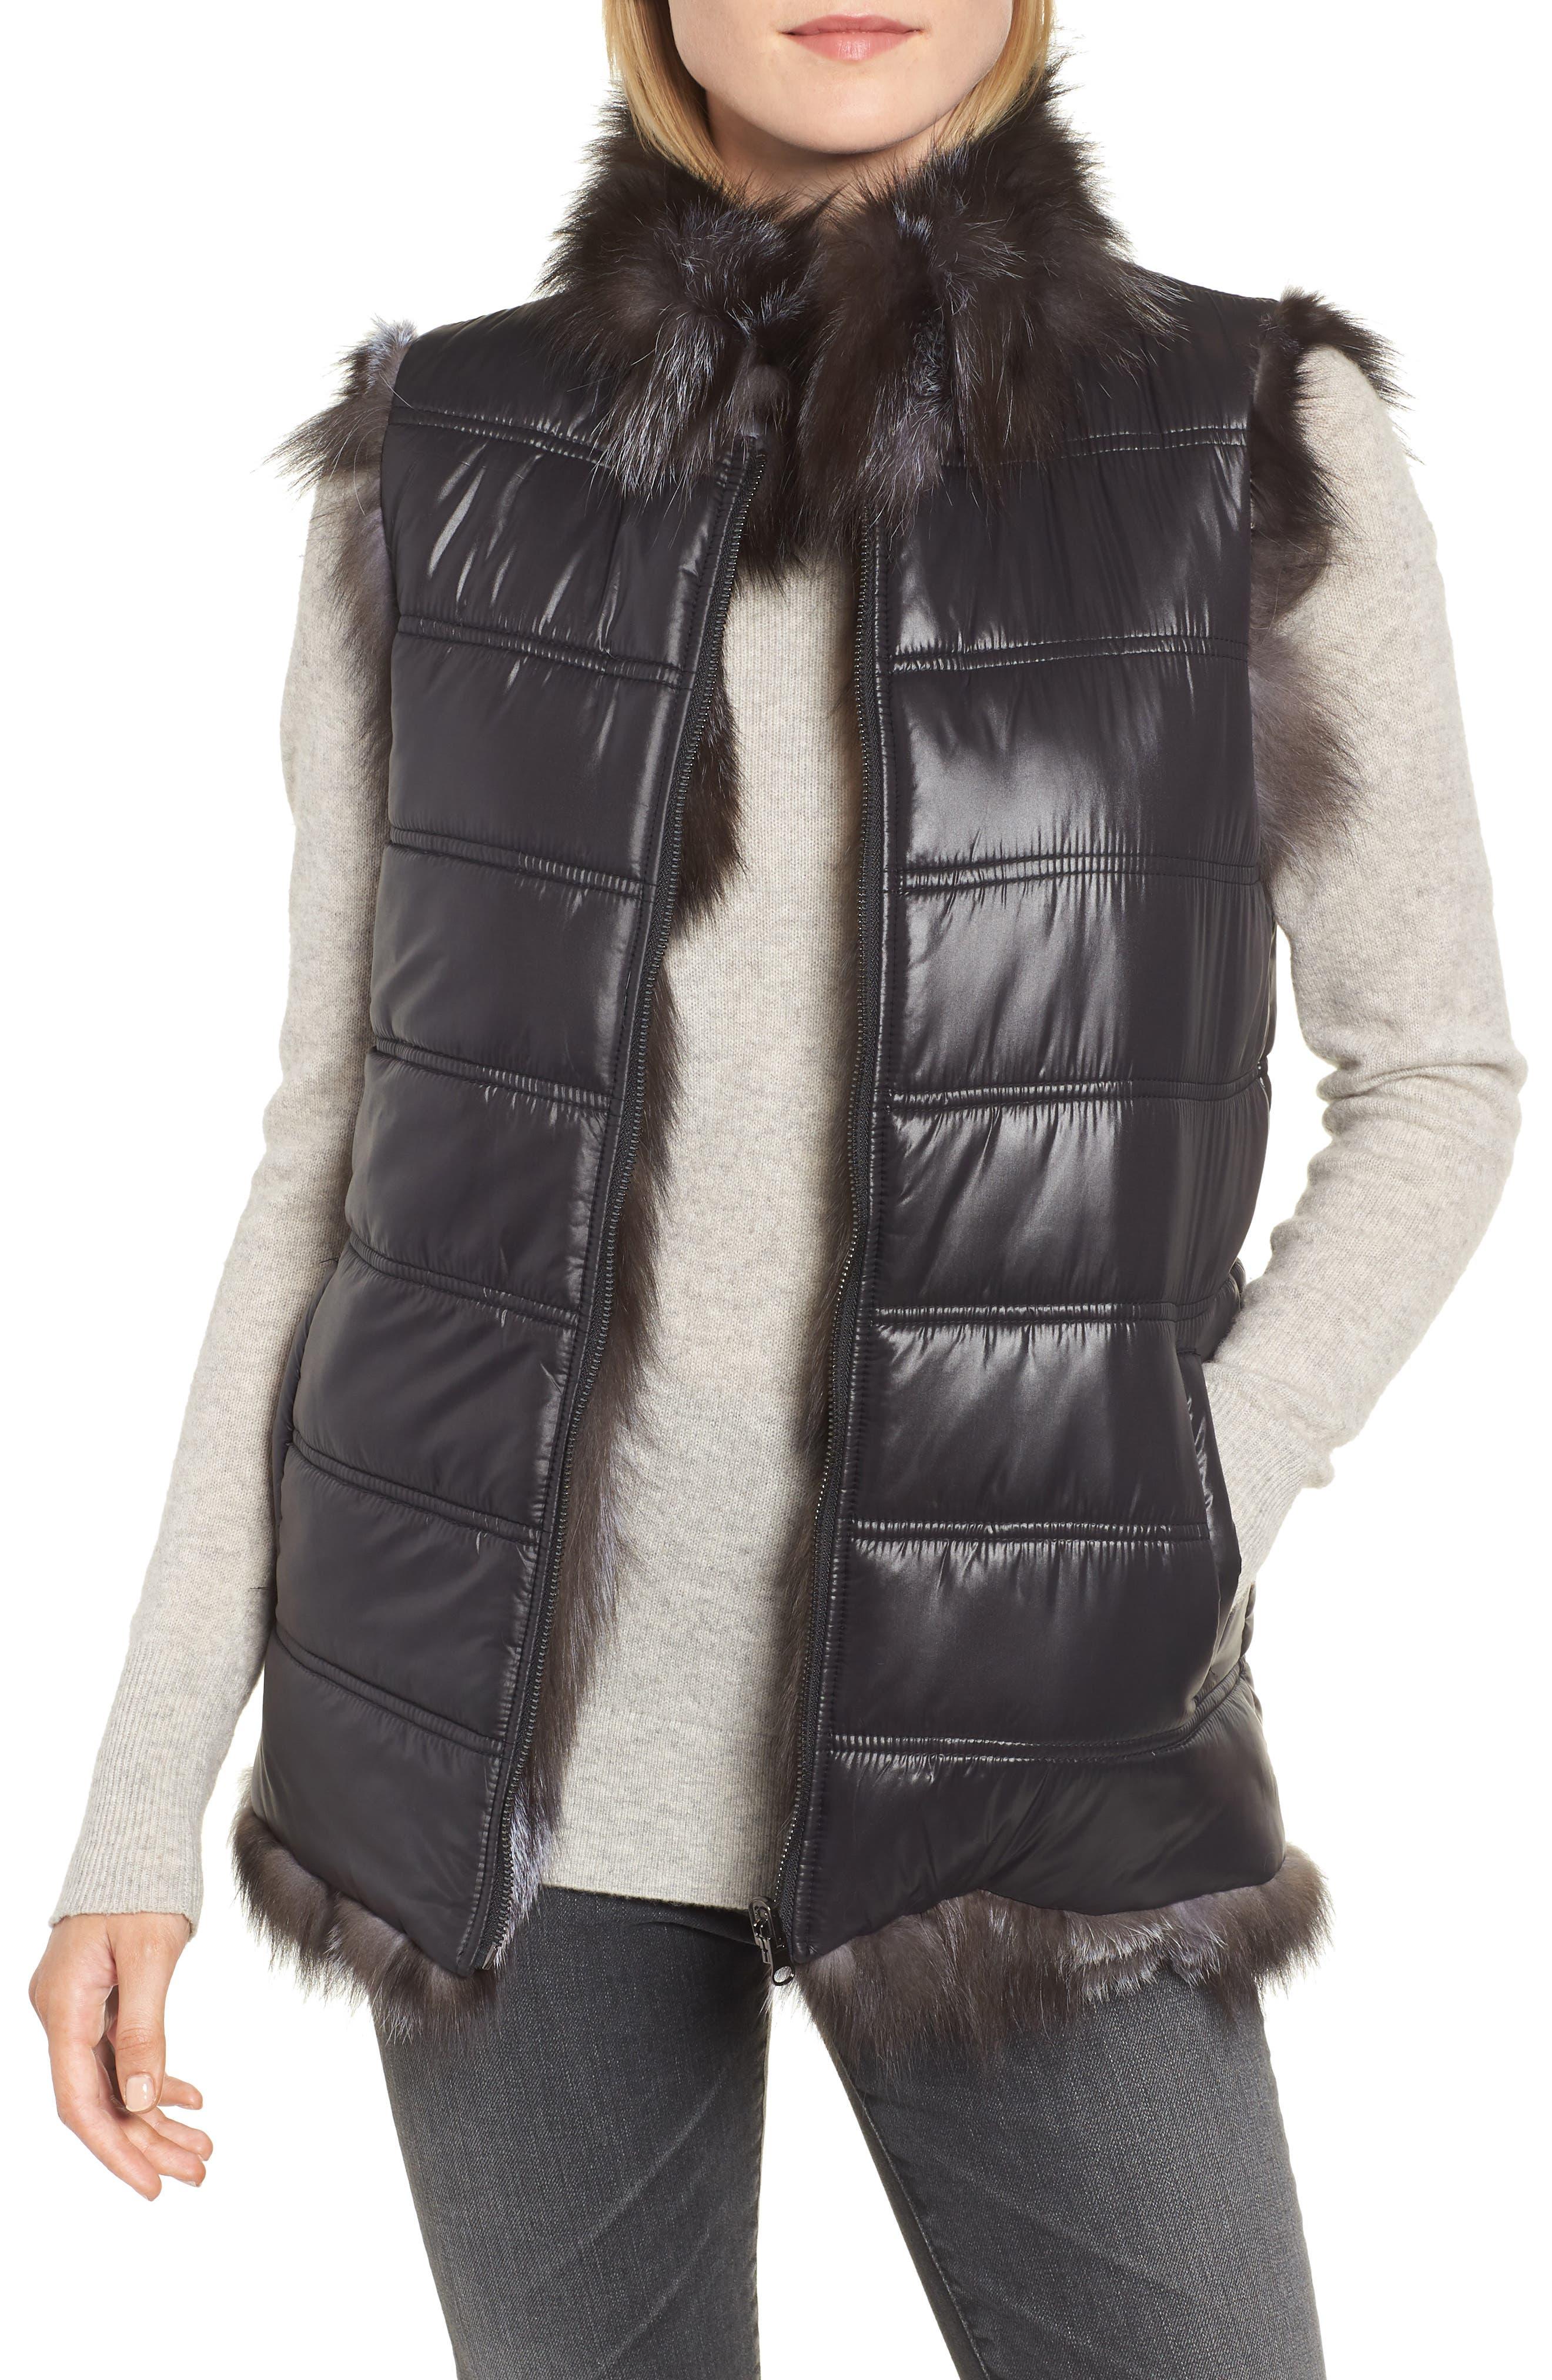 LINDA RICHARDS Reversible Genuine Silver Fox Fur Vest, Main, color, BLACK/ SILVER